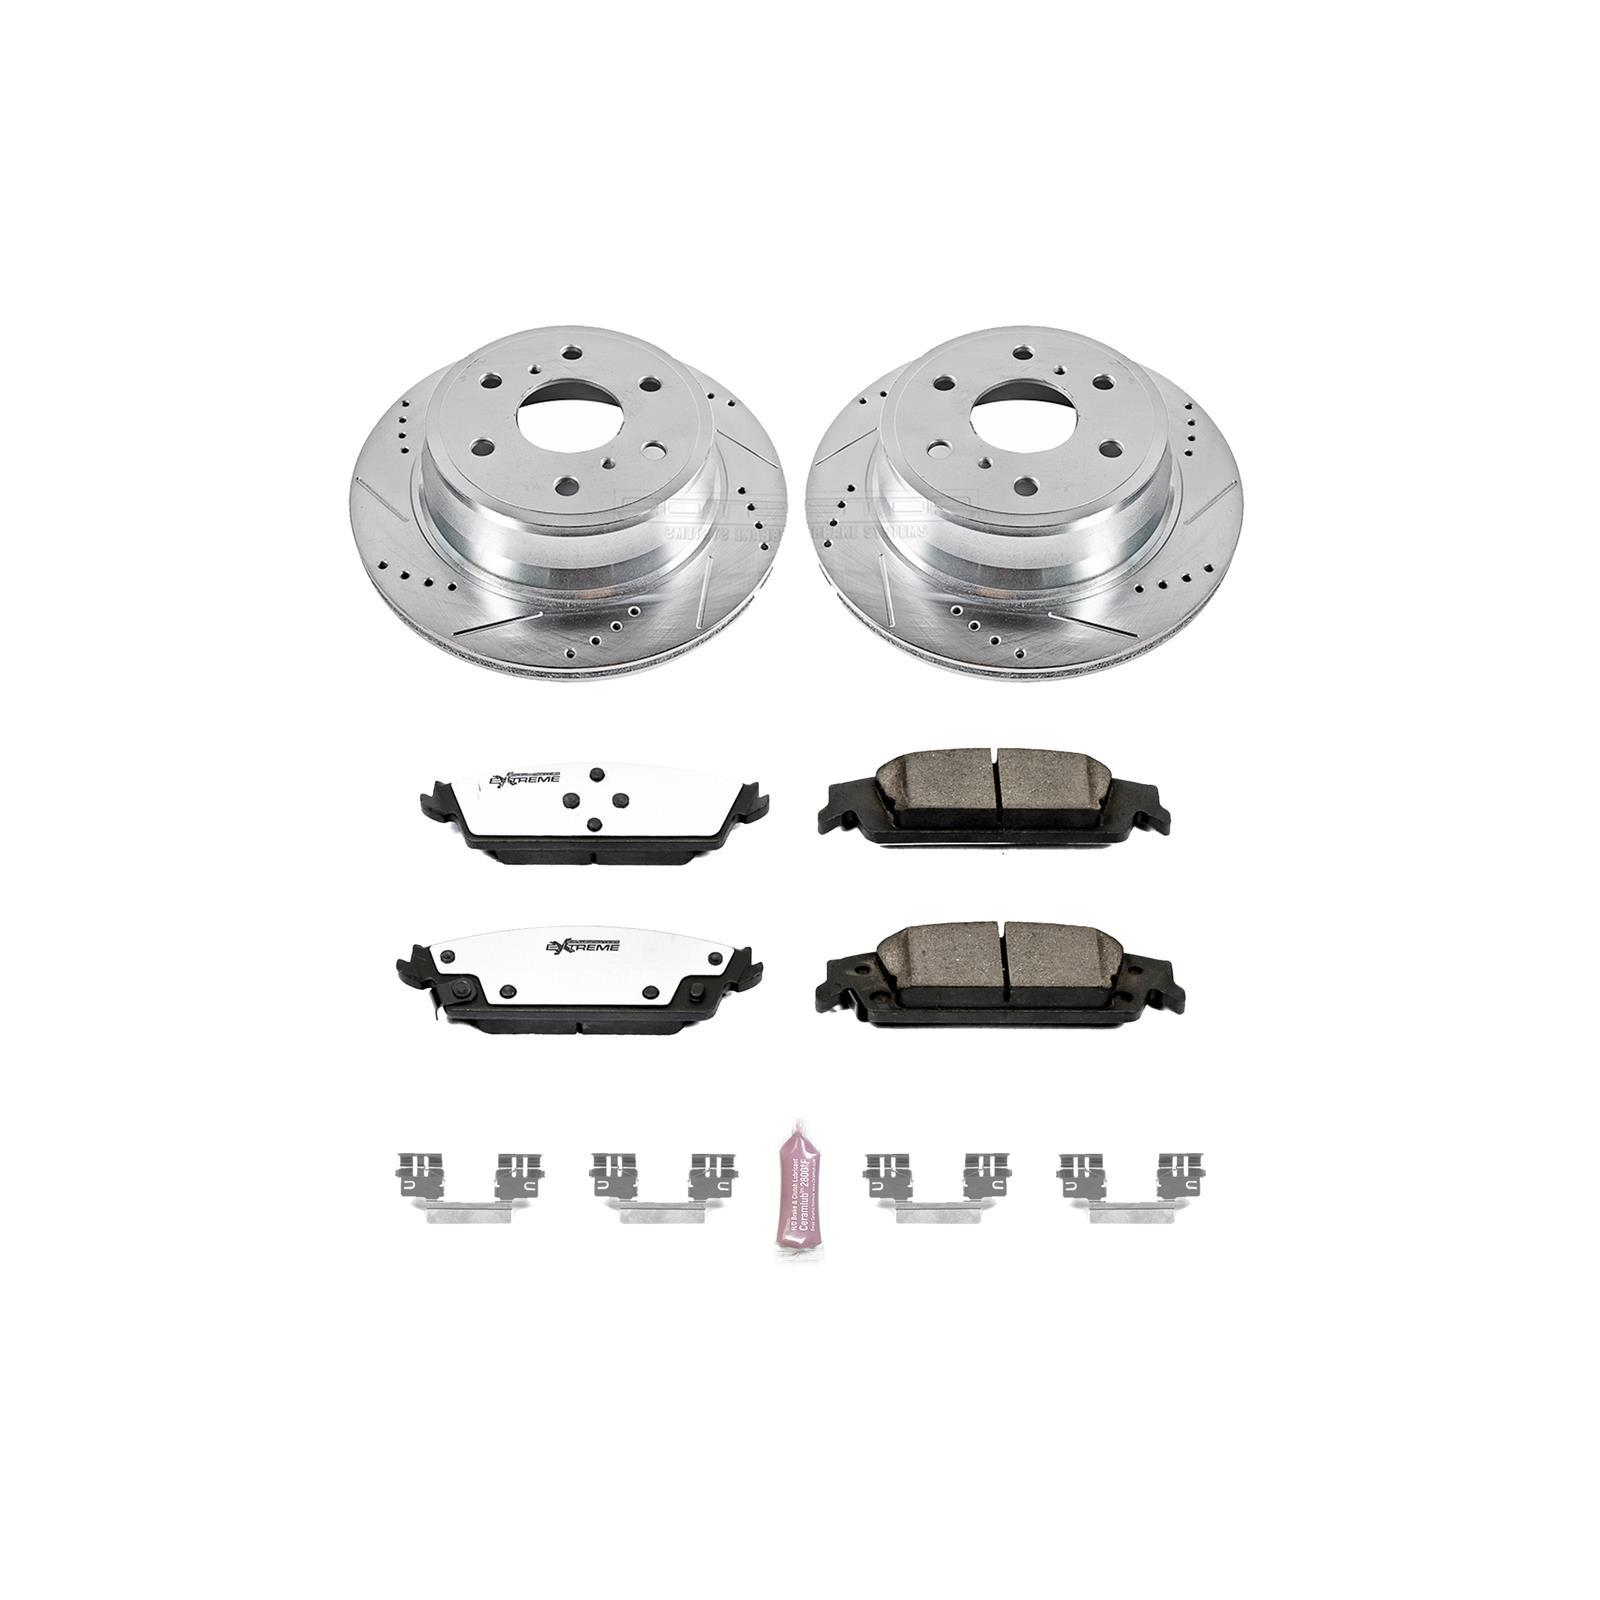 E-Coated OE Rotors + Metallic Pads Max Brakes Rear Elite Brake Kit TA071402 Fits: 2008 08 2009 09 2010 10 2011 11 Dodge Grand Caravan